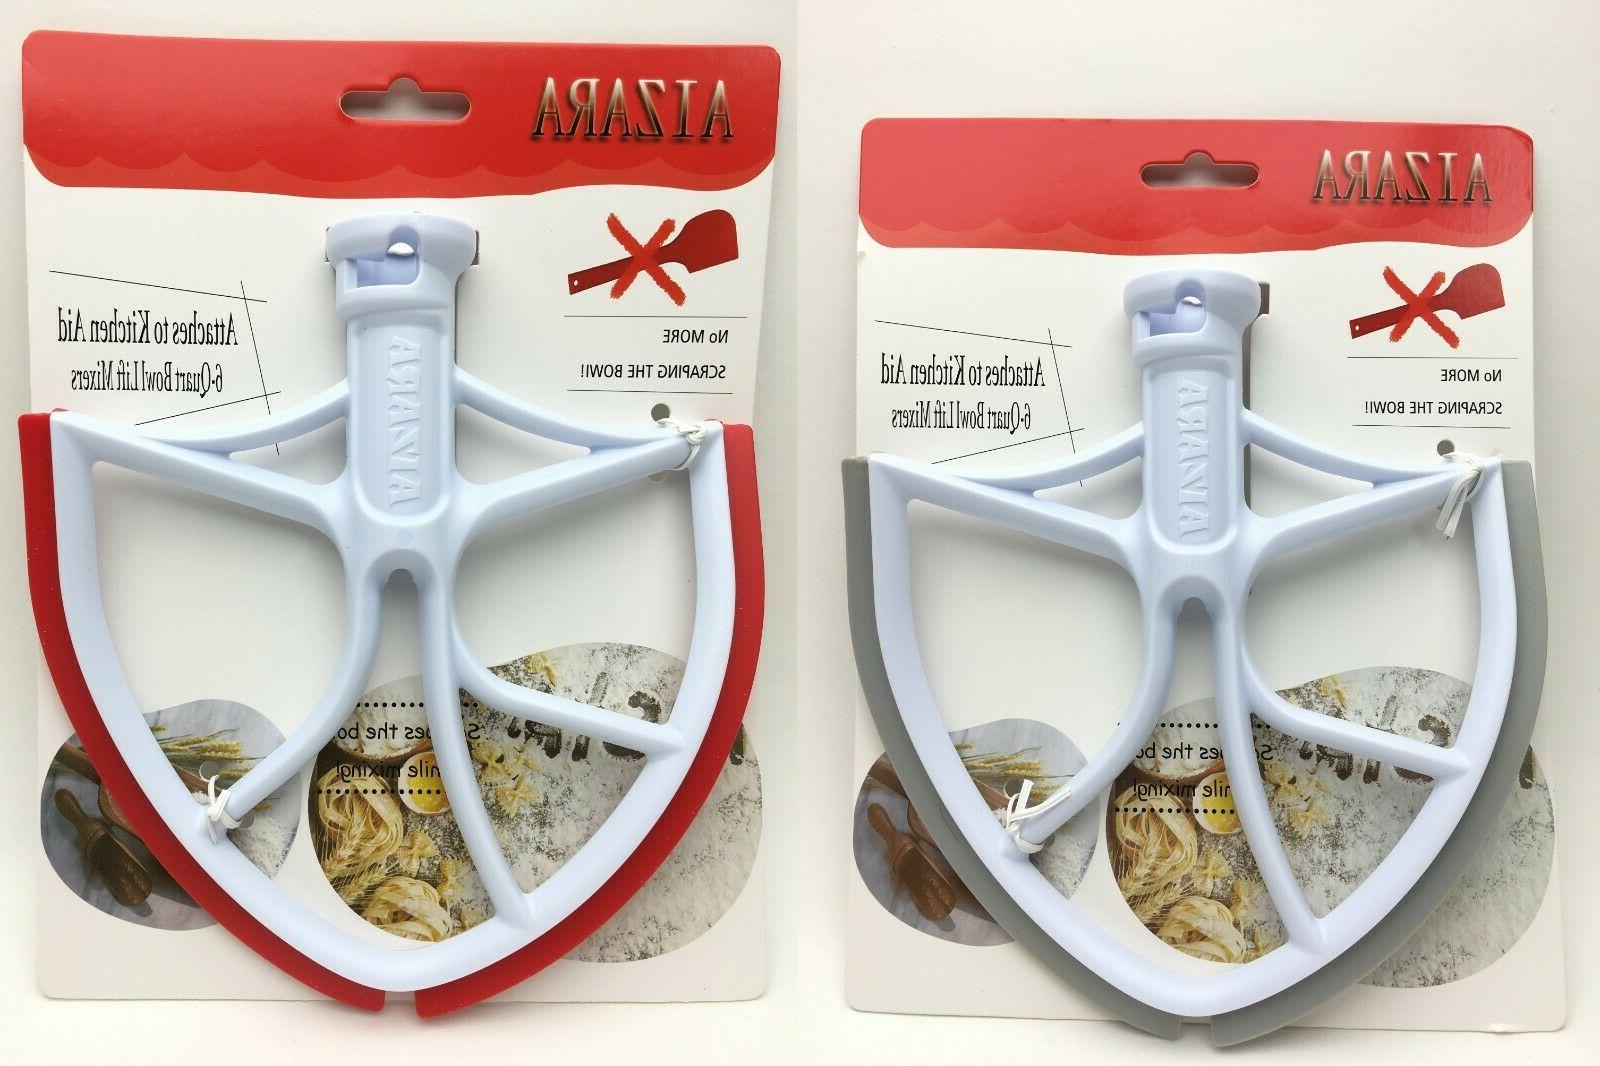 flex edge beater blade for kitchenaid 6